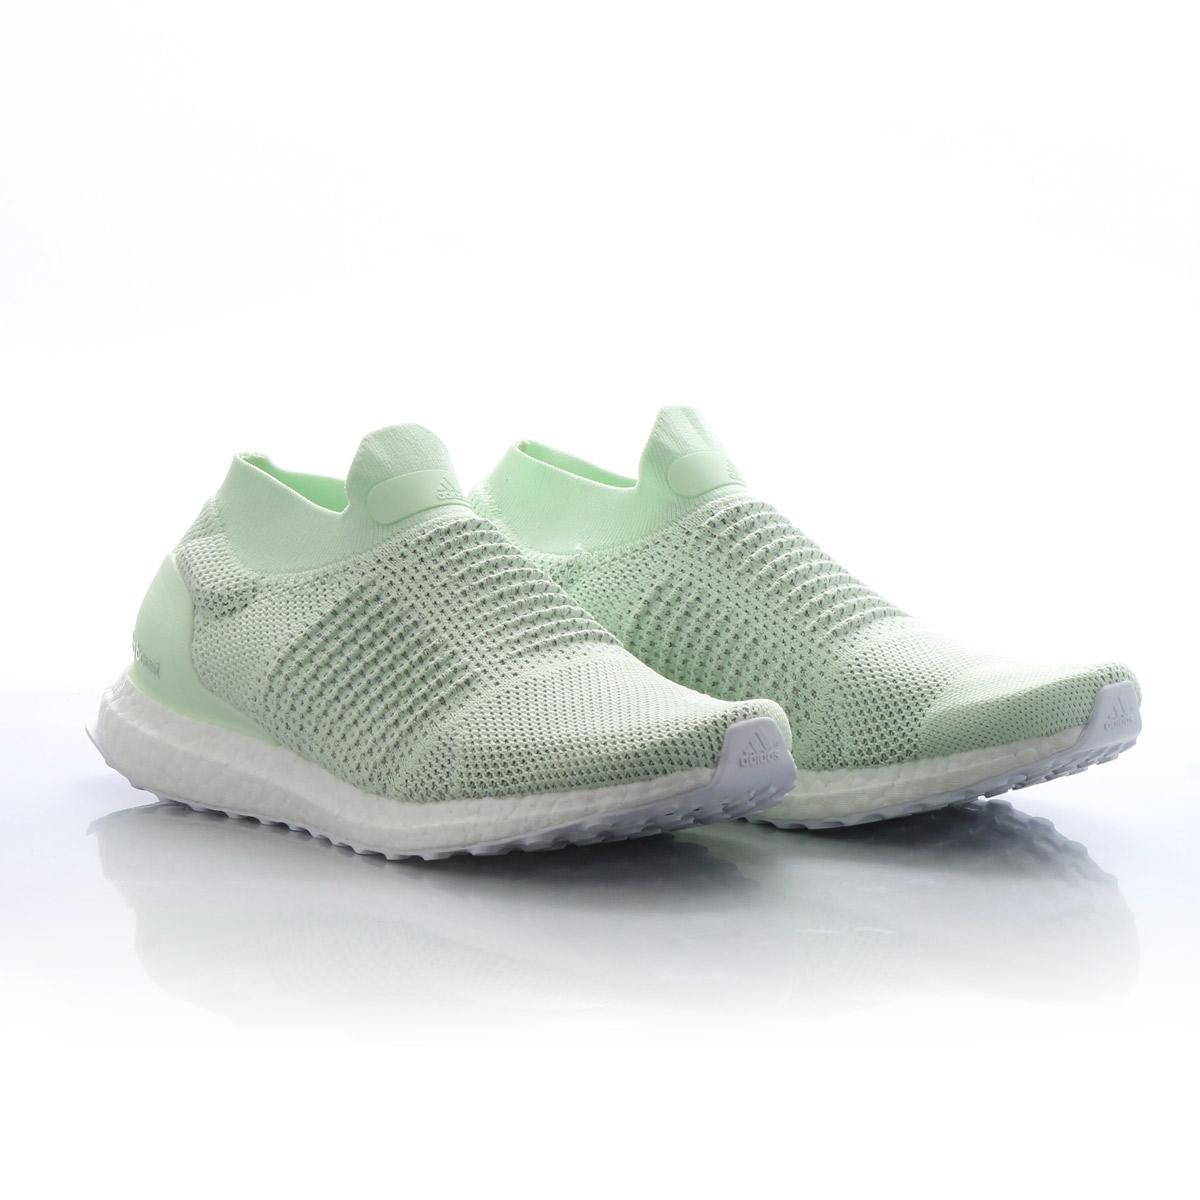 adidas Originals UltraBOOST Laceless LTD Zapatillas BB6223